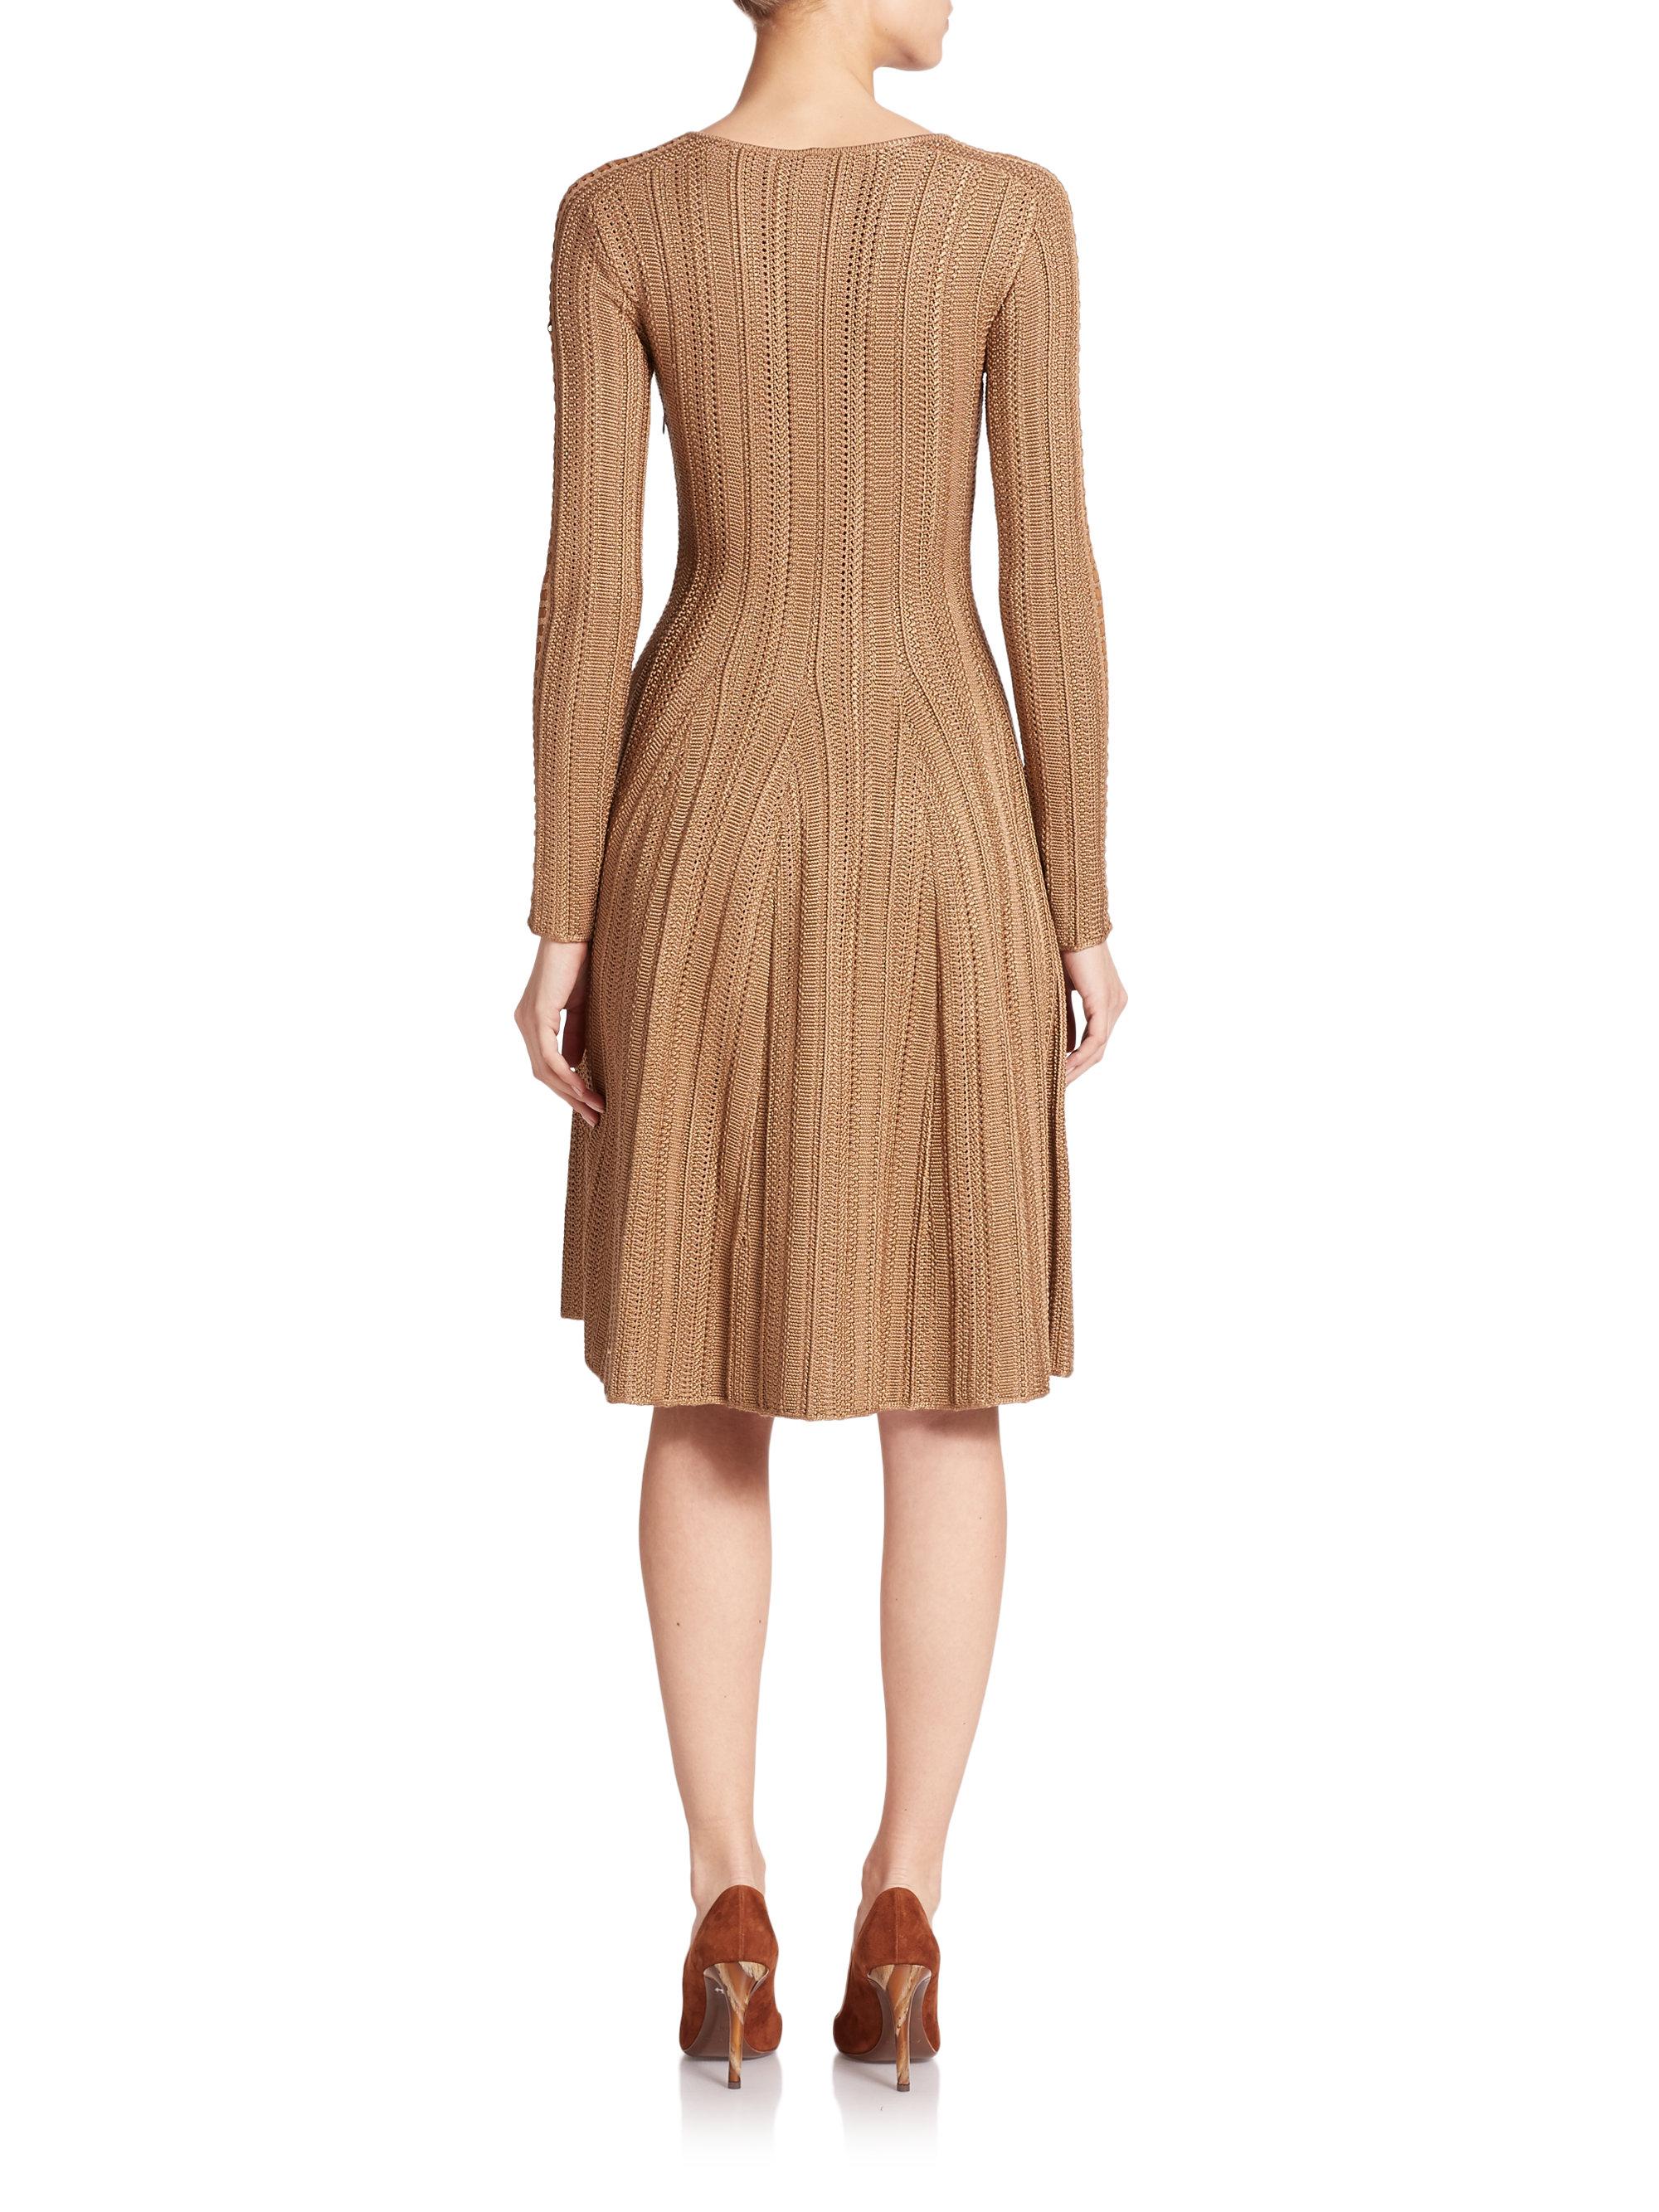 Ralph Lauren Suede Trimmed Silk Knit Dress In Camel Brown